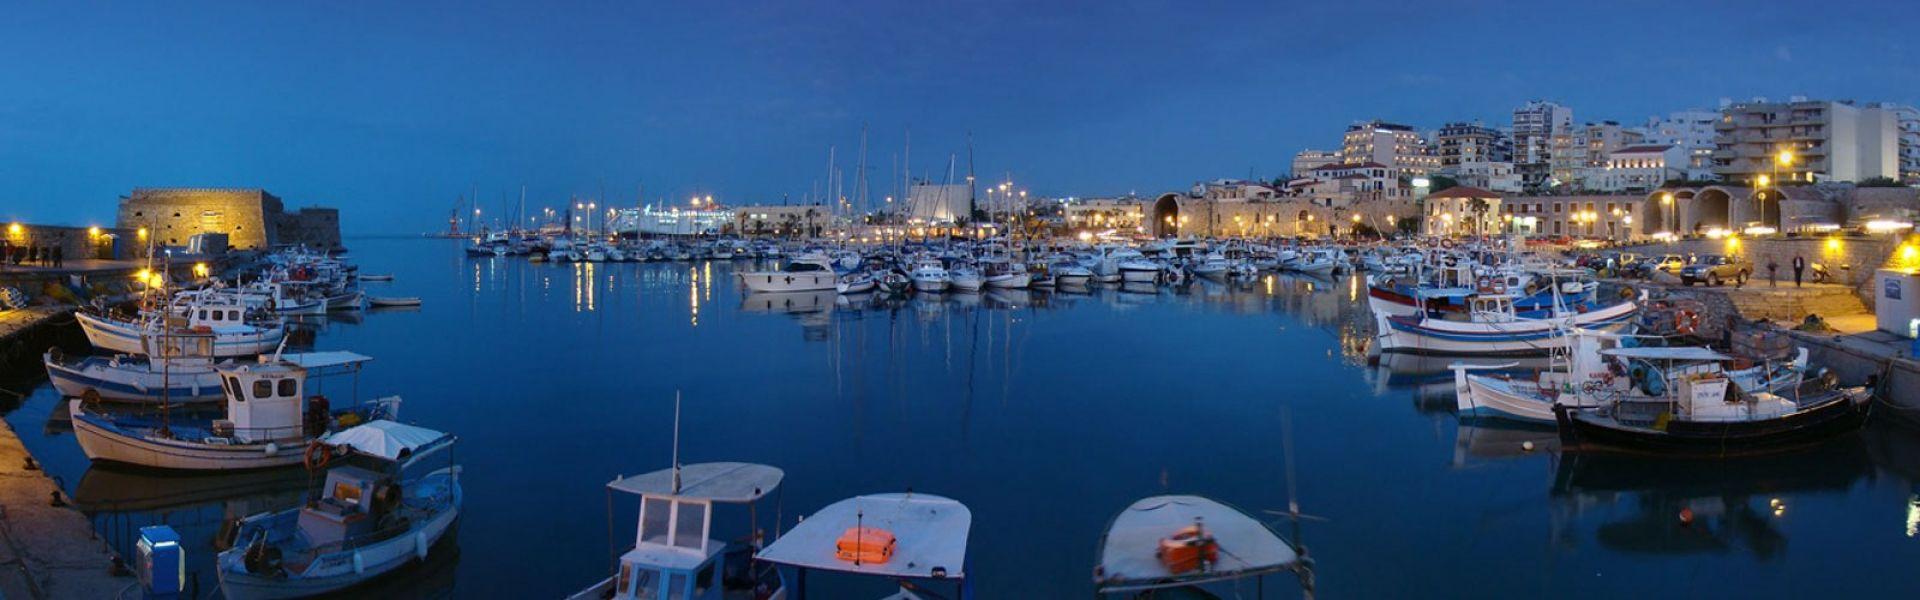 Venetian FOld Harbor - Heraklion cityortress - Heraklion city